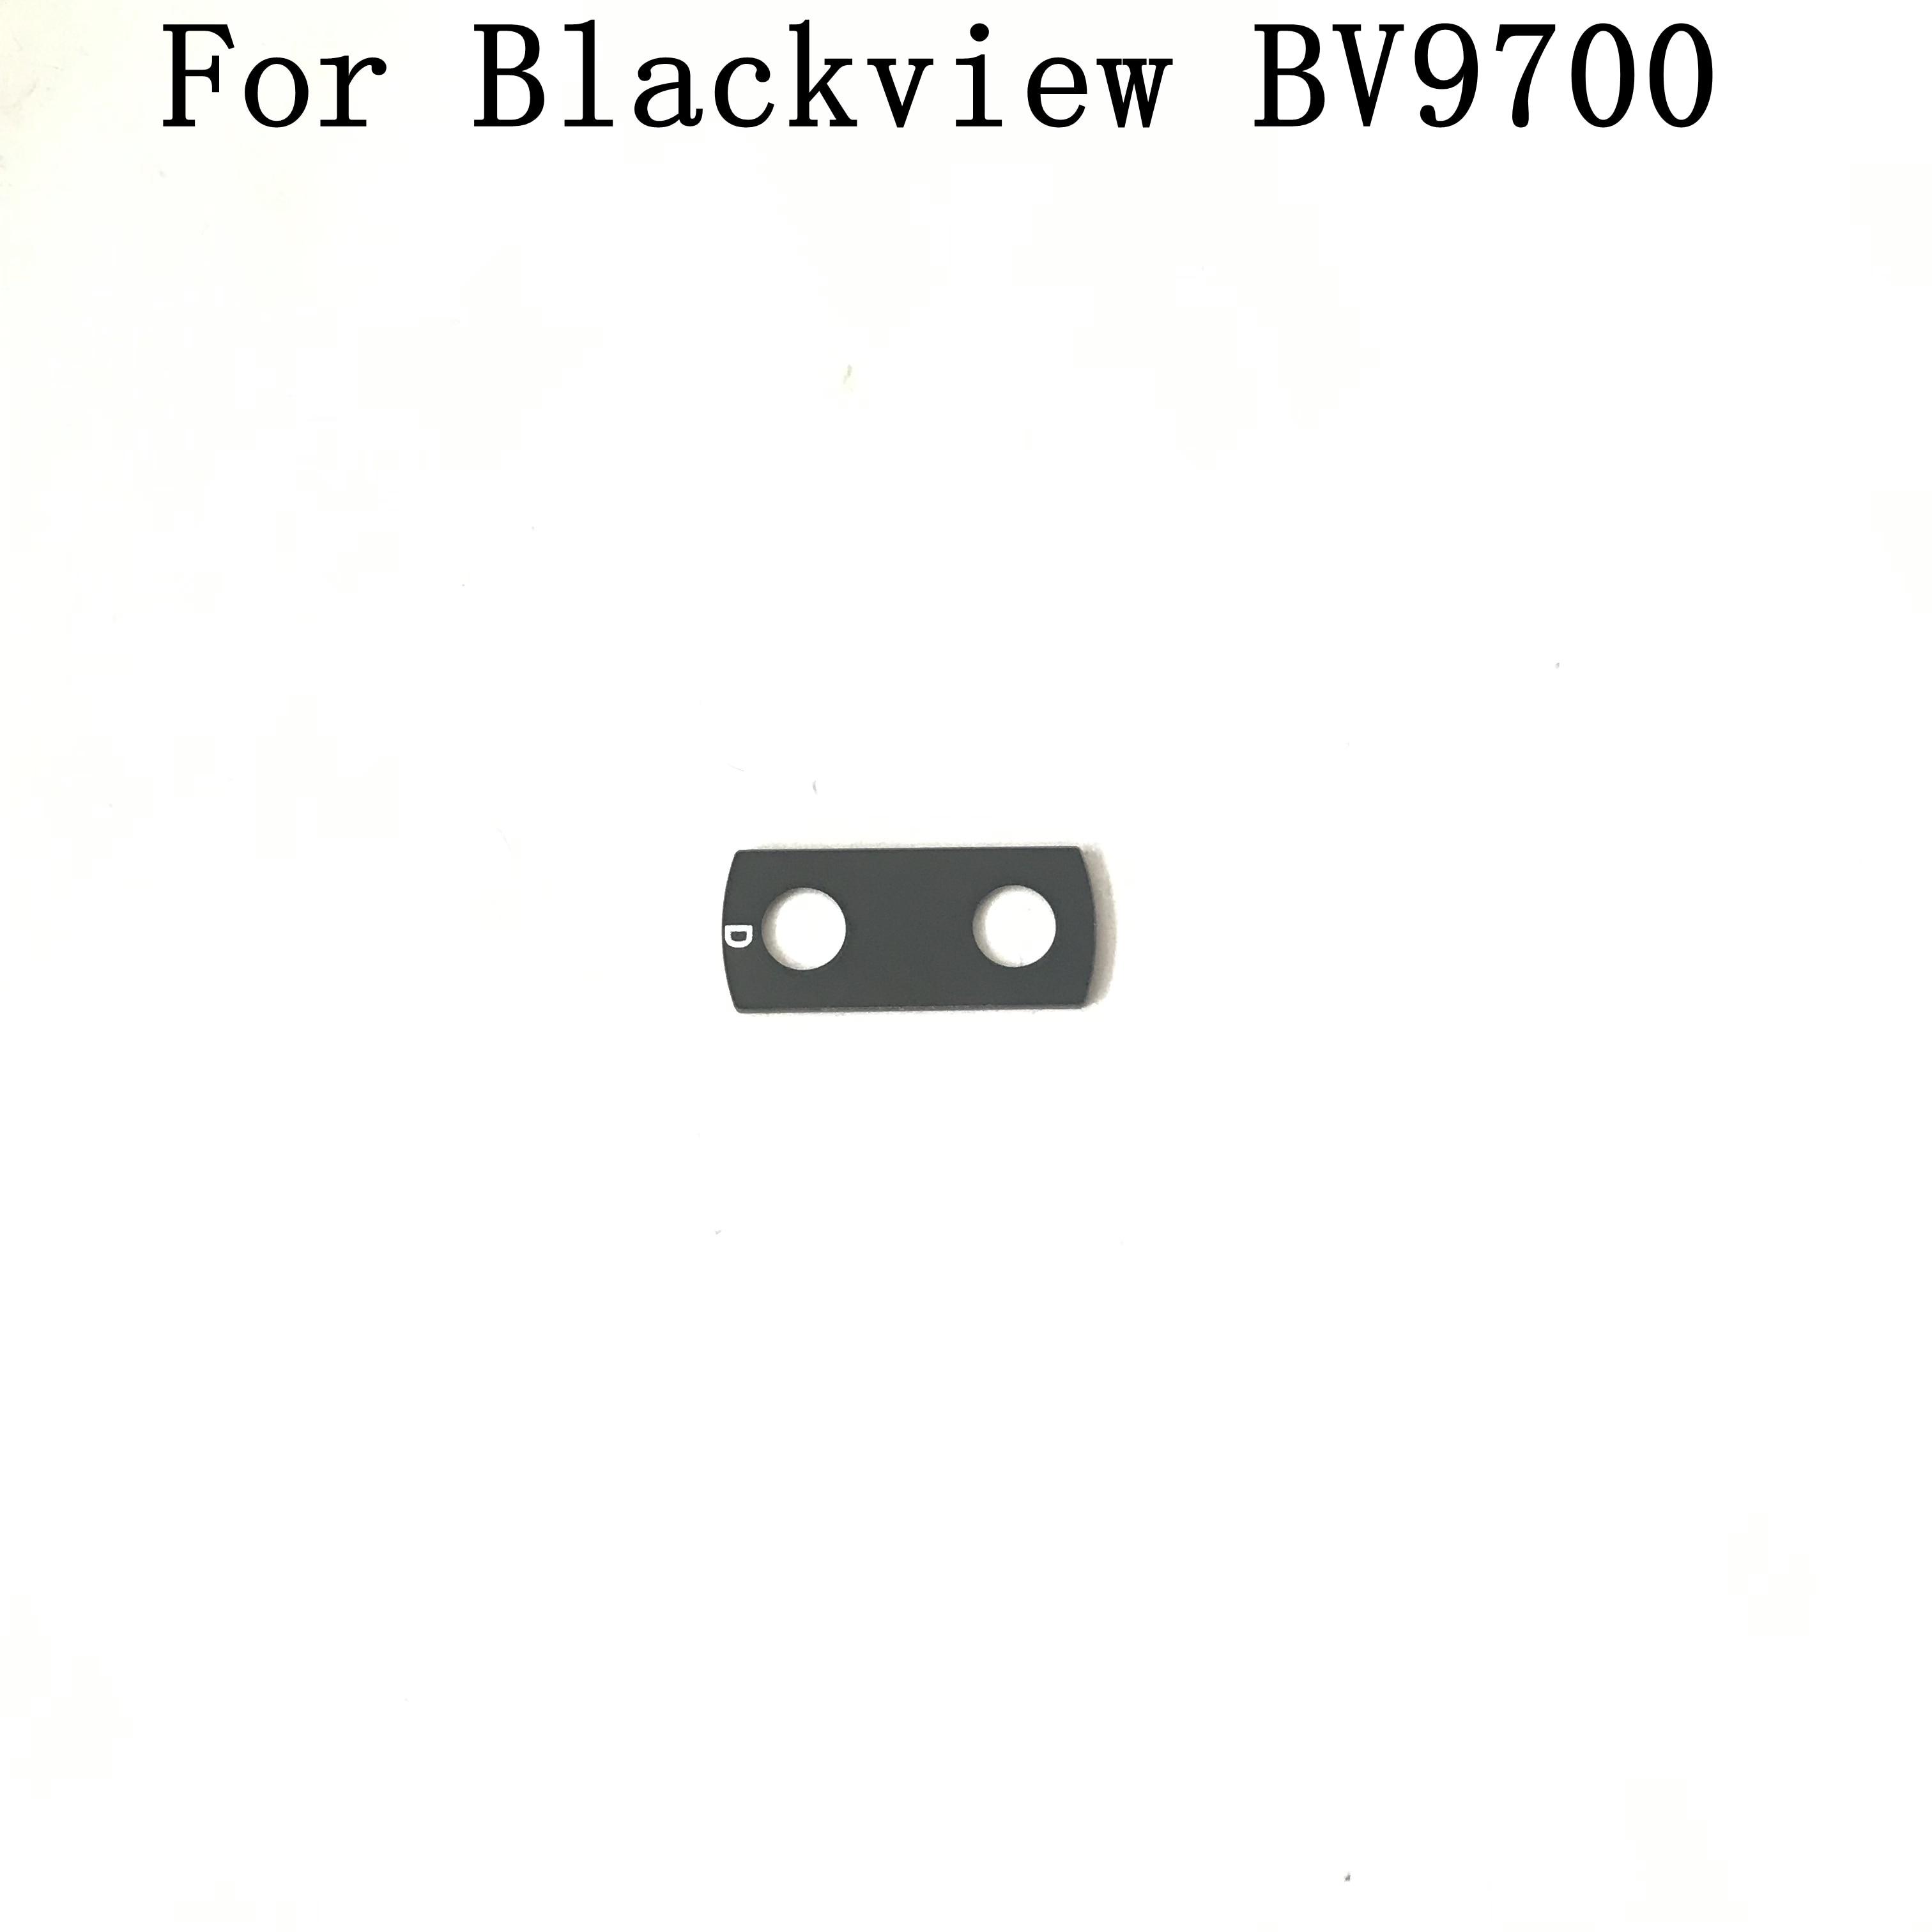 Blackview BV9700 Original New Camera Glass Camera Lens Rear Cover For Blackview BV9700 Pro Repair Fixing Part Replacement